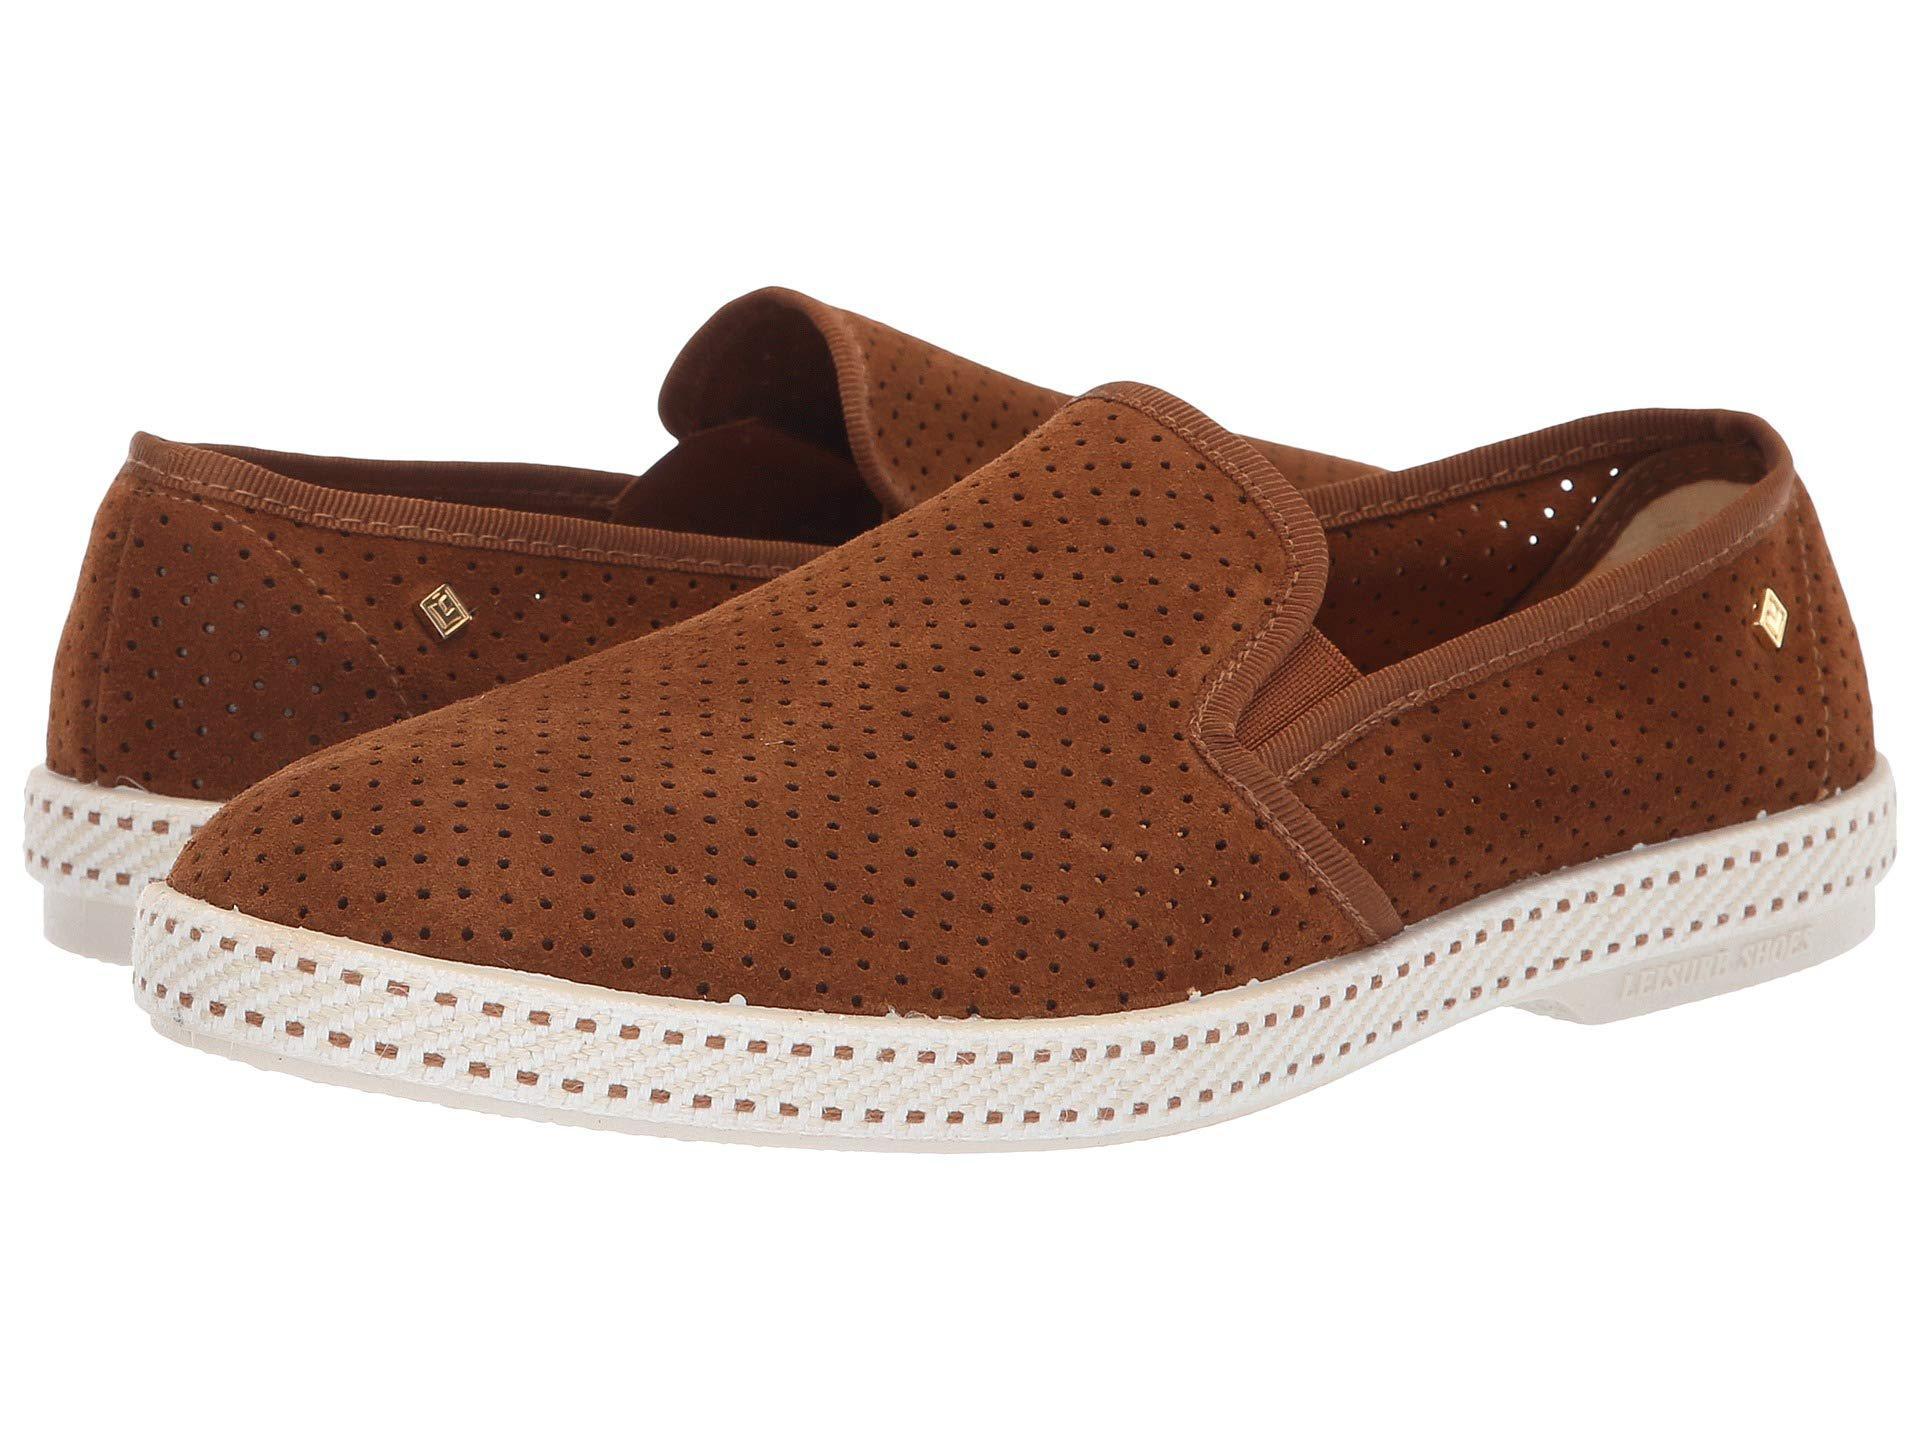 7db77aa43ec Lyst - Rivieras Sultan 30 Slip-on (marine) Men s Slip On Shoes in ...